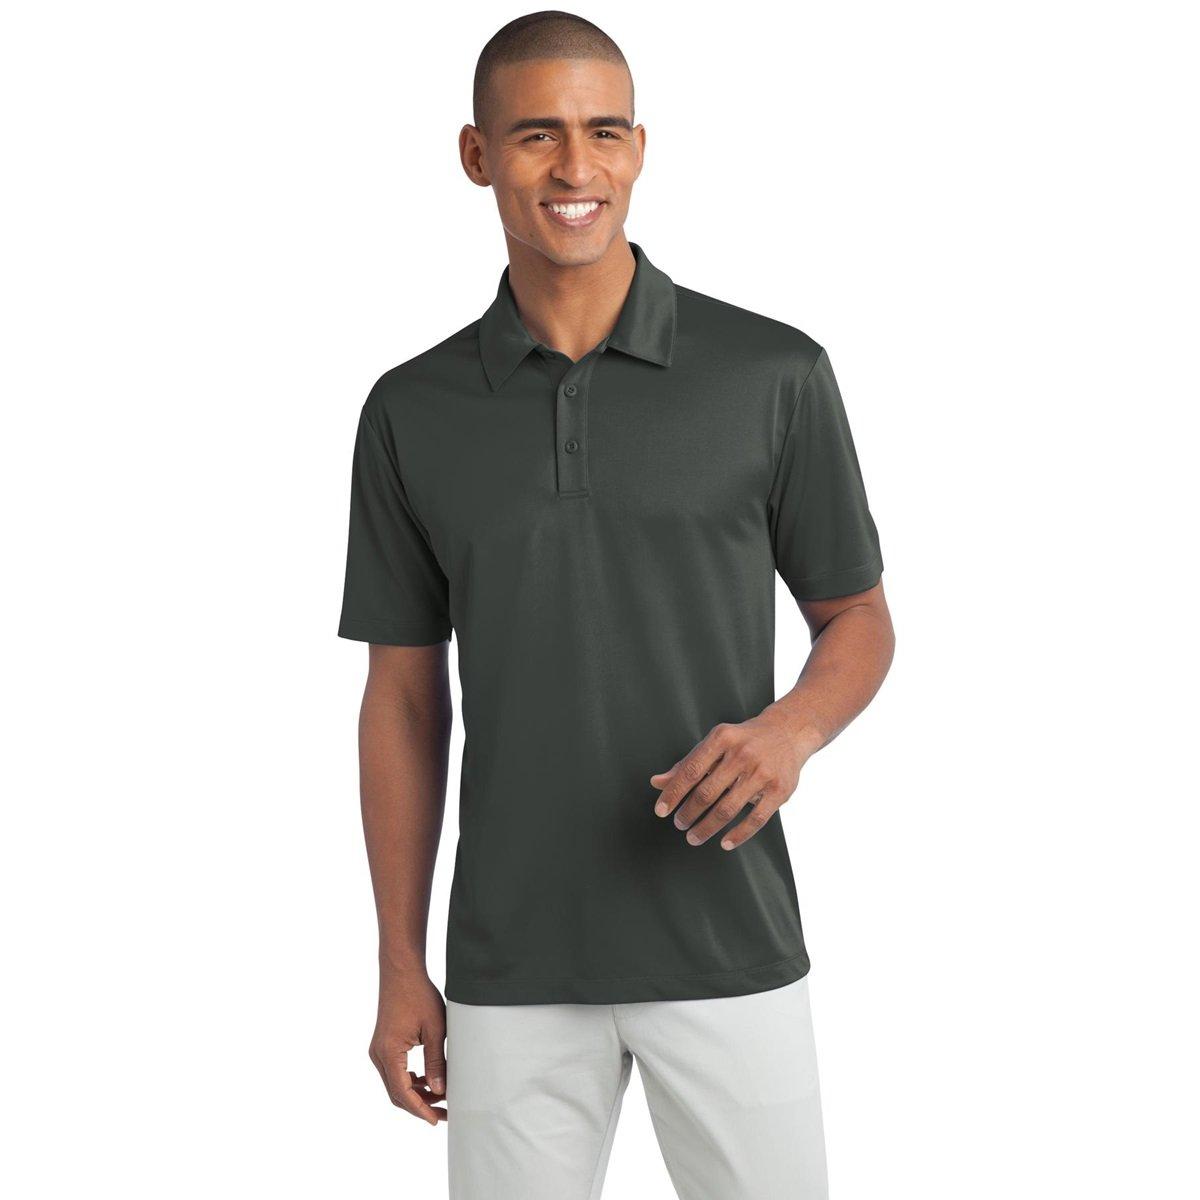 Mens Big /& Tall Short Sleeve Moisture Wicking Silk Touch Polo Shirt Clothe Co